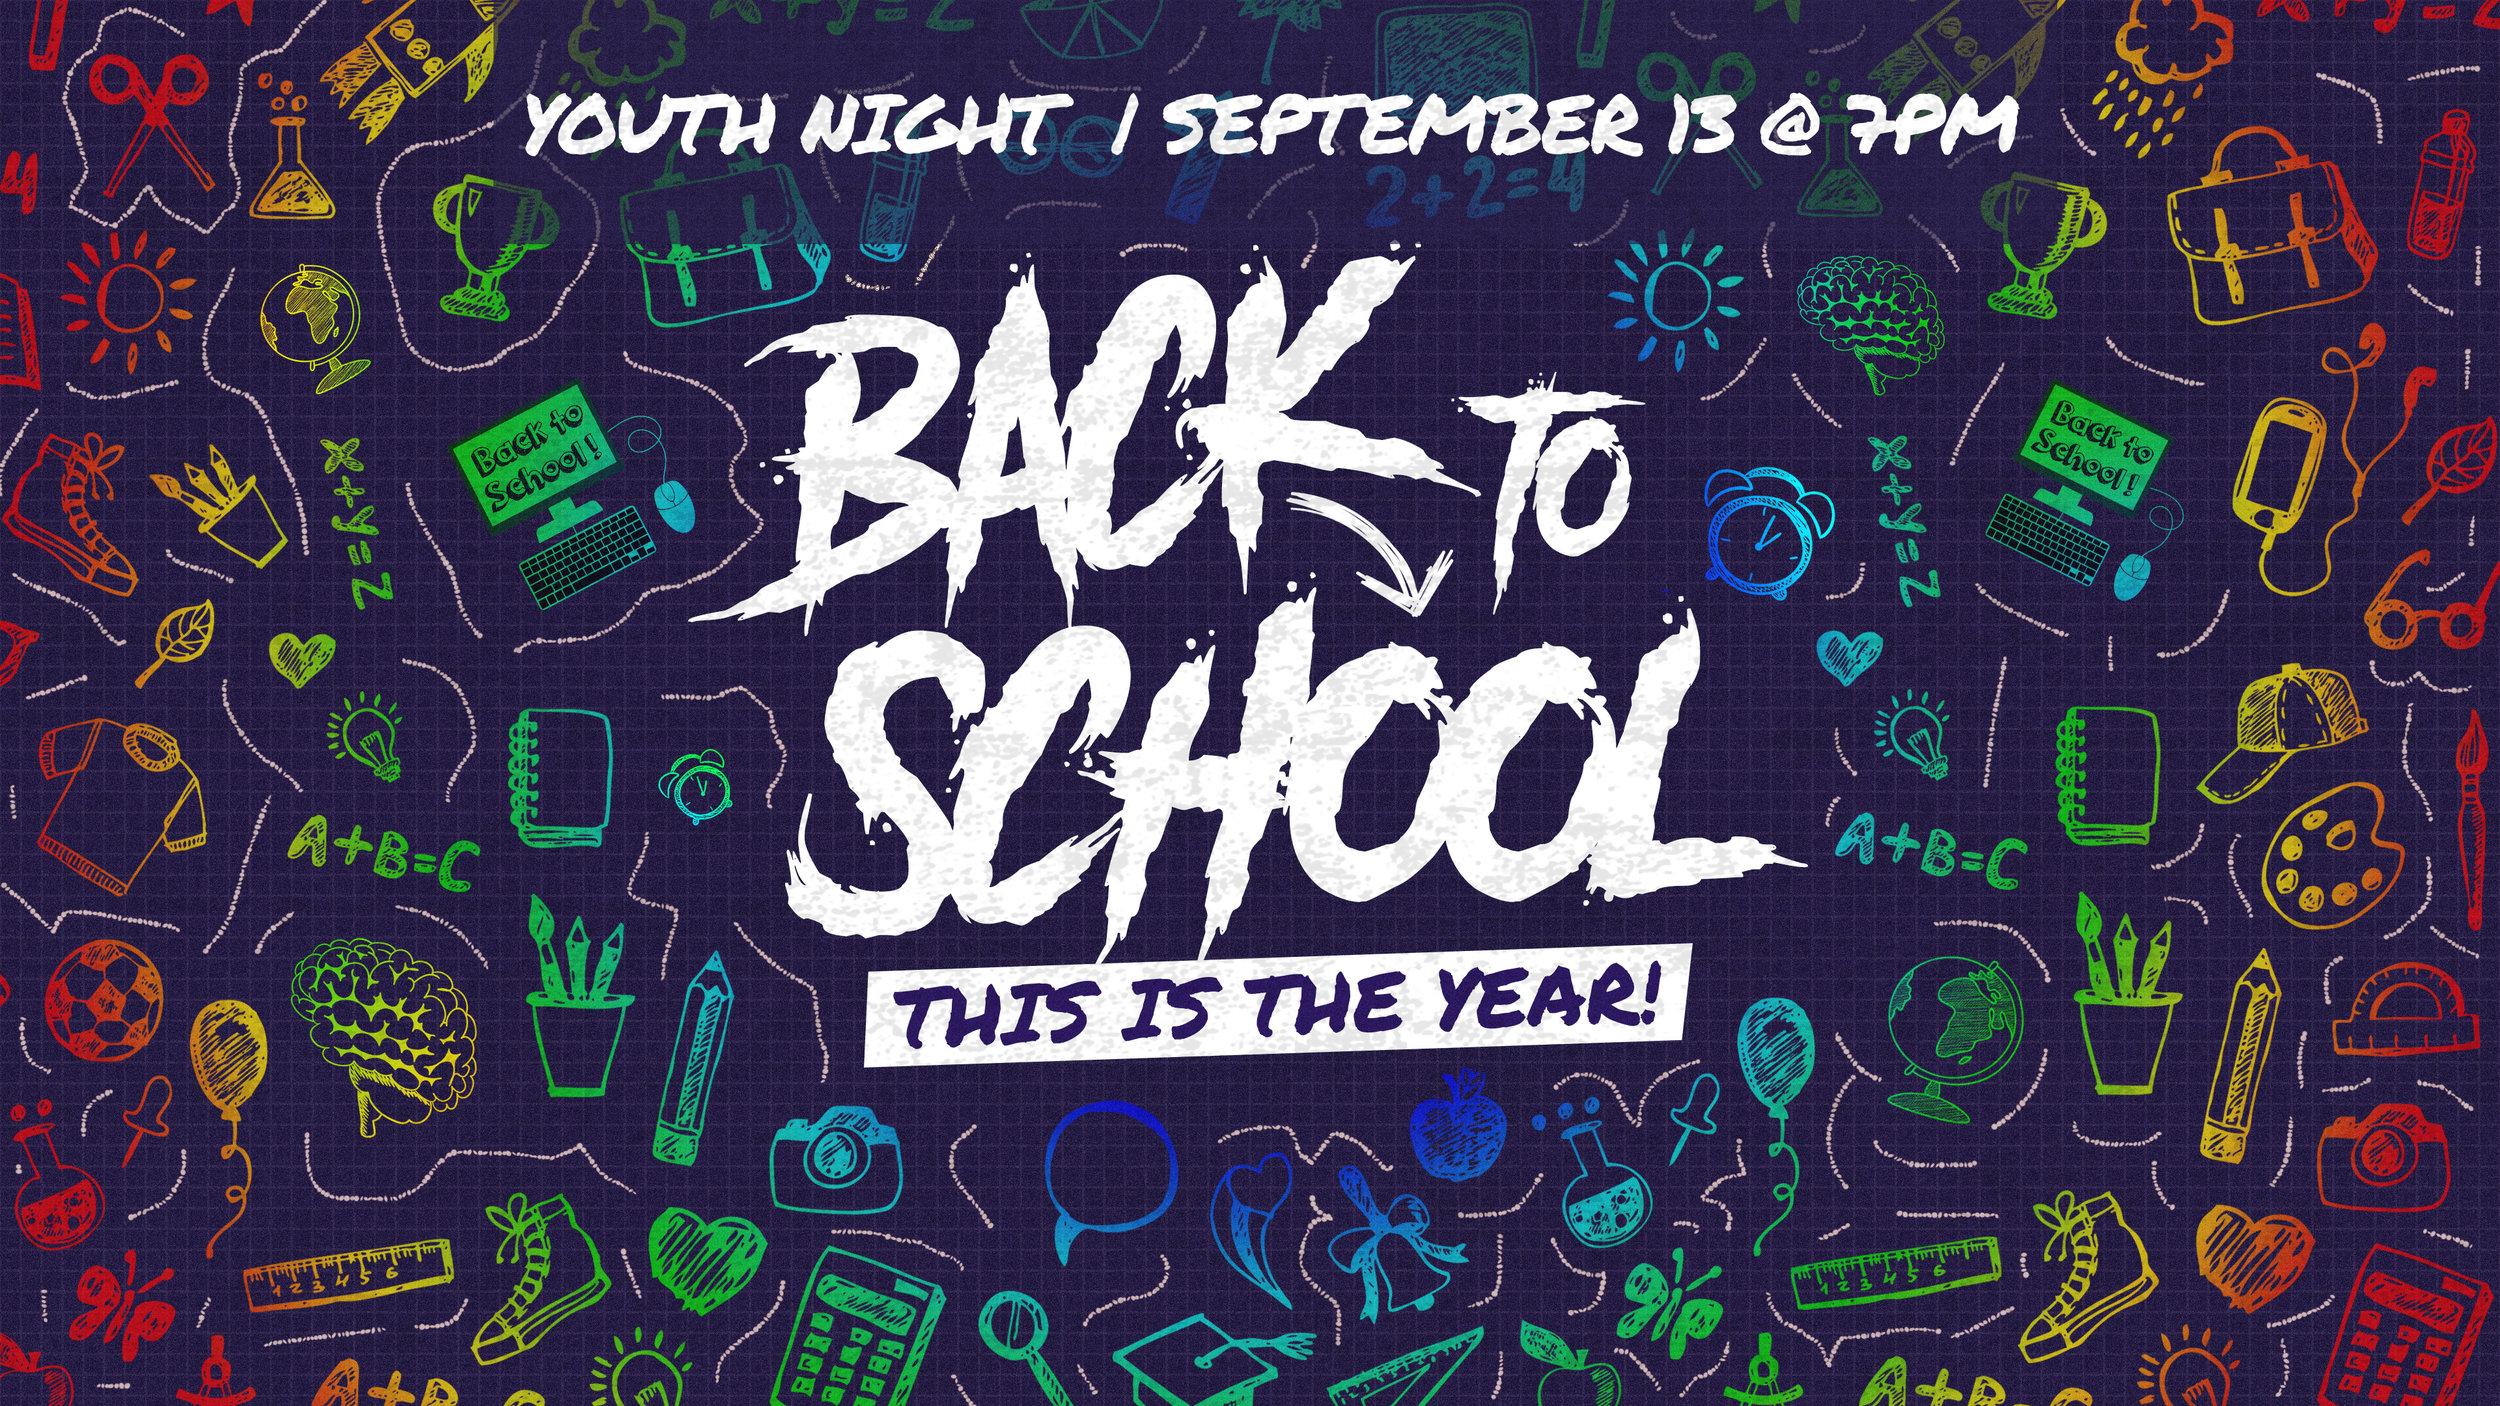 Back-To-School-YouthNight2019.jpg